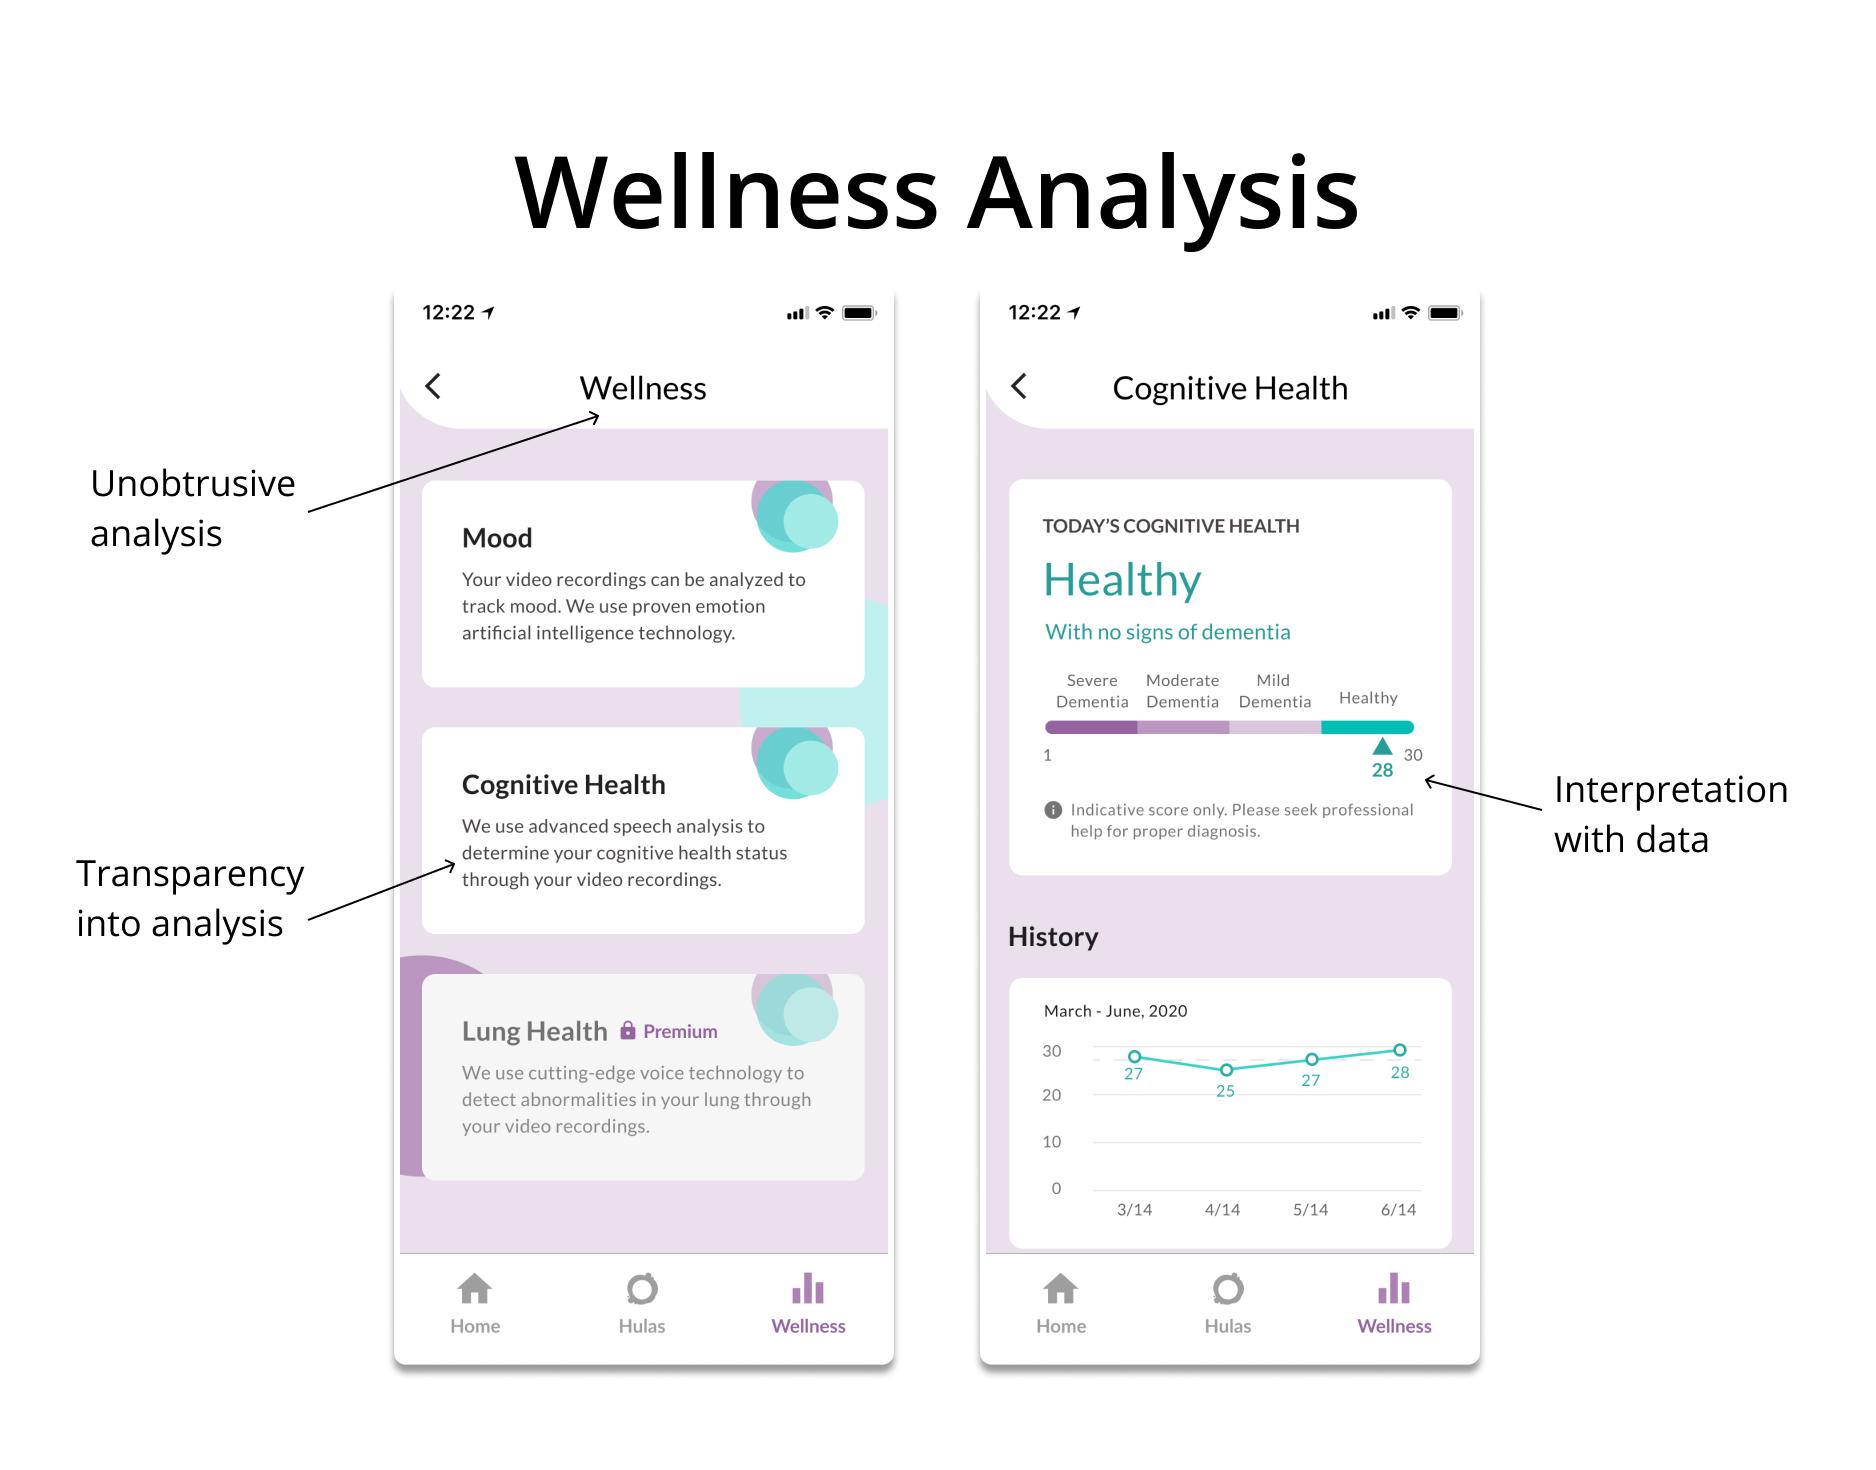 WellnessAnalysis-1